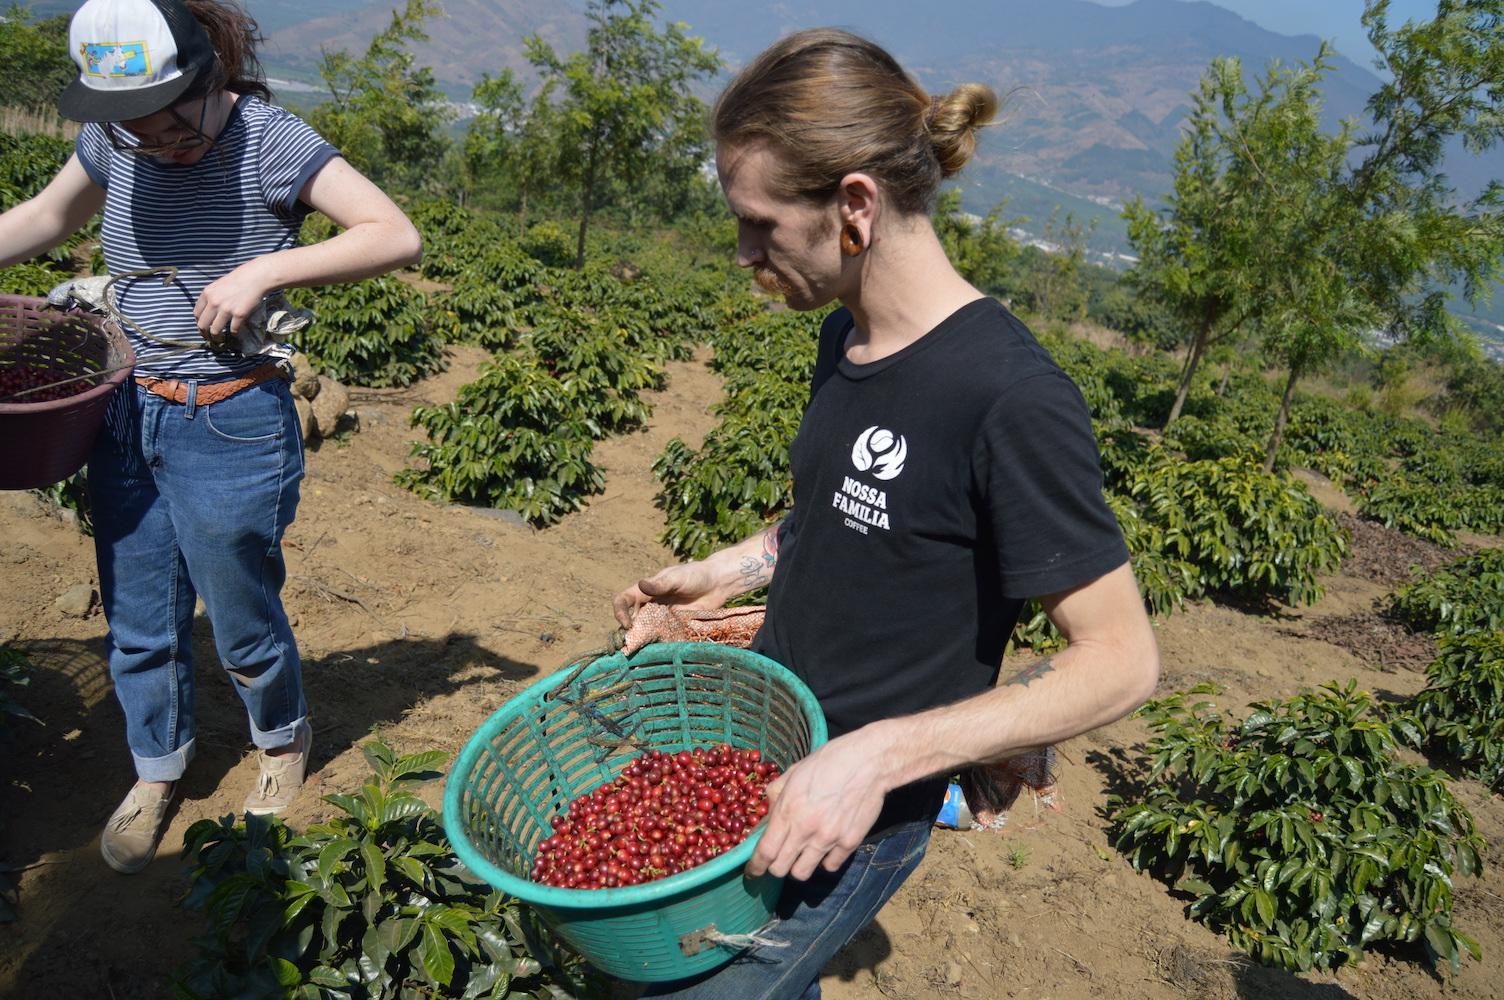 Nossa Familia barista & roaster Kyle harvests coffee cherries